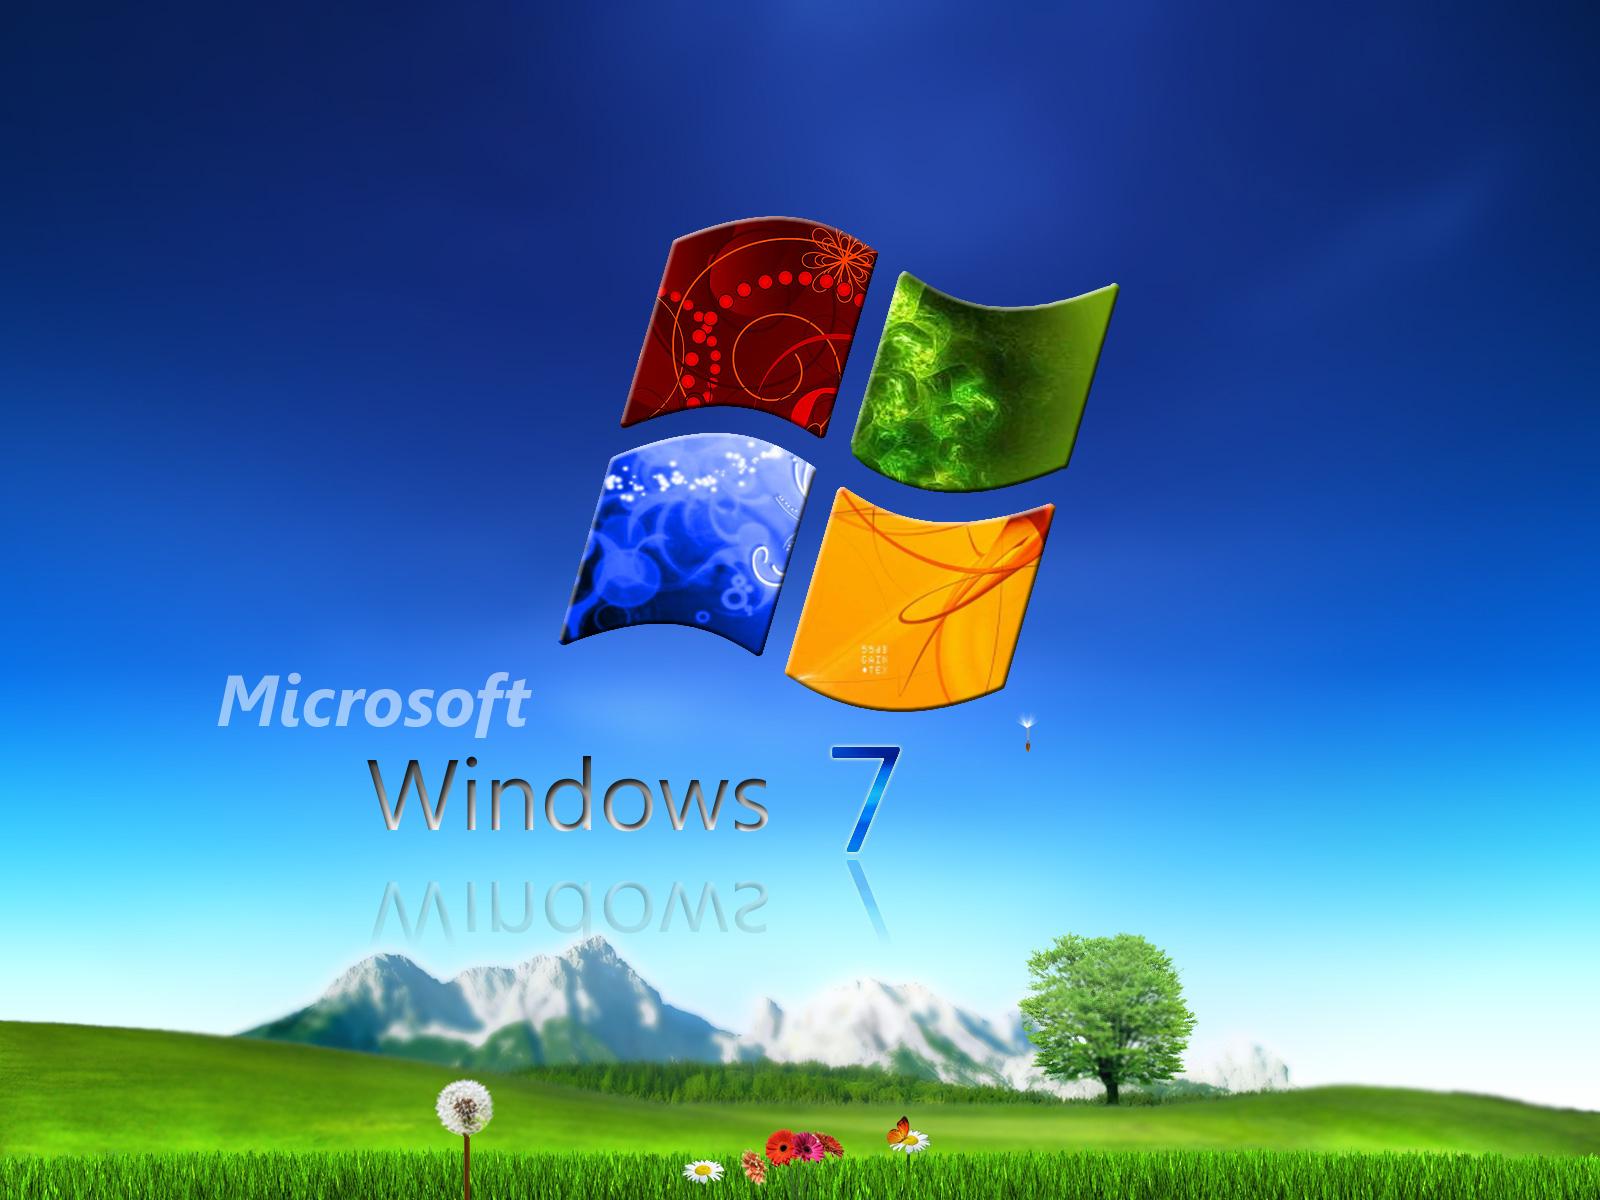 3D Wallpaper Windows 7 Pro - WallpaperSafari